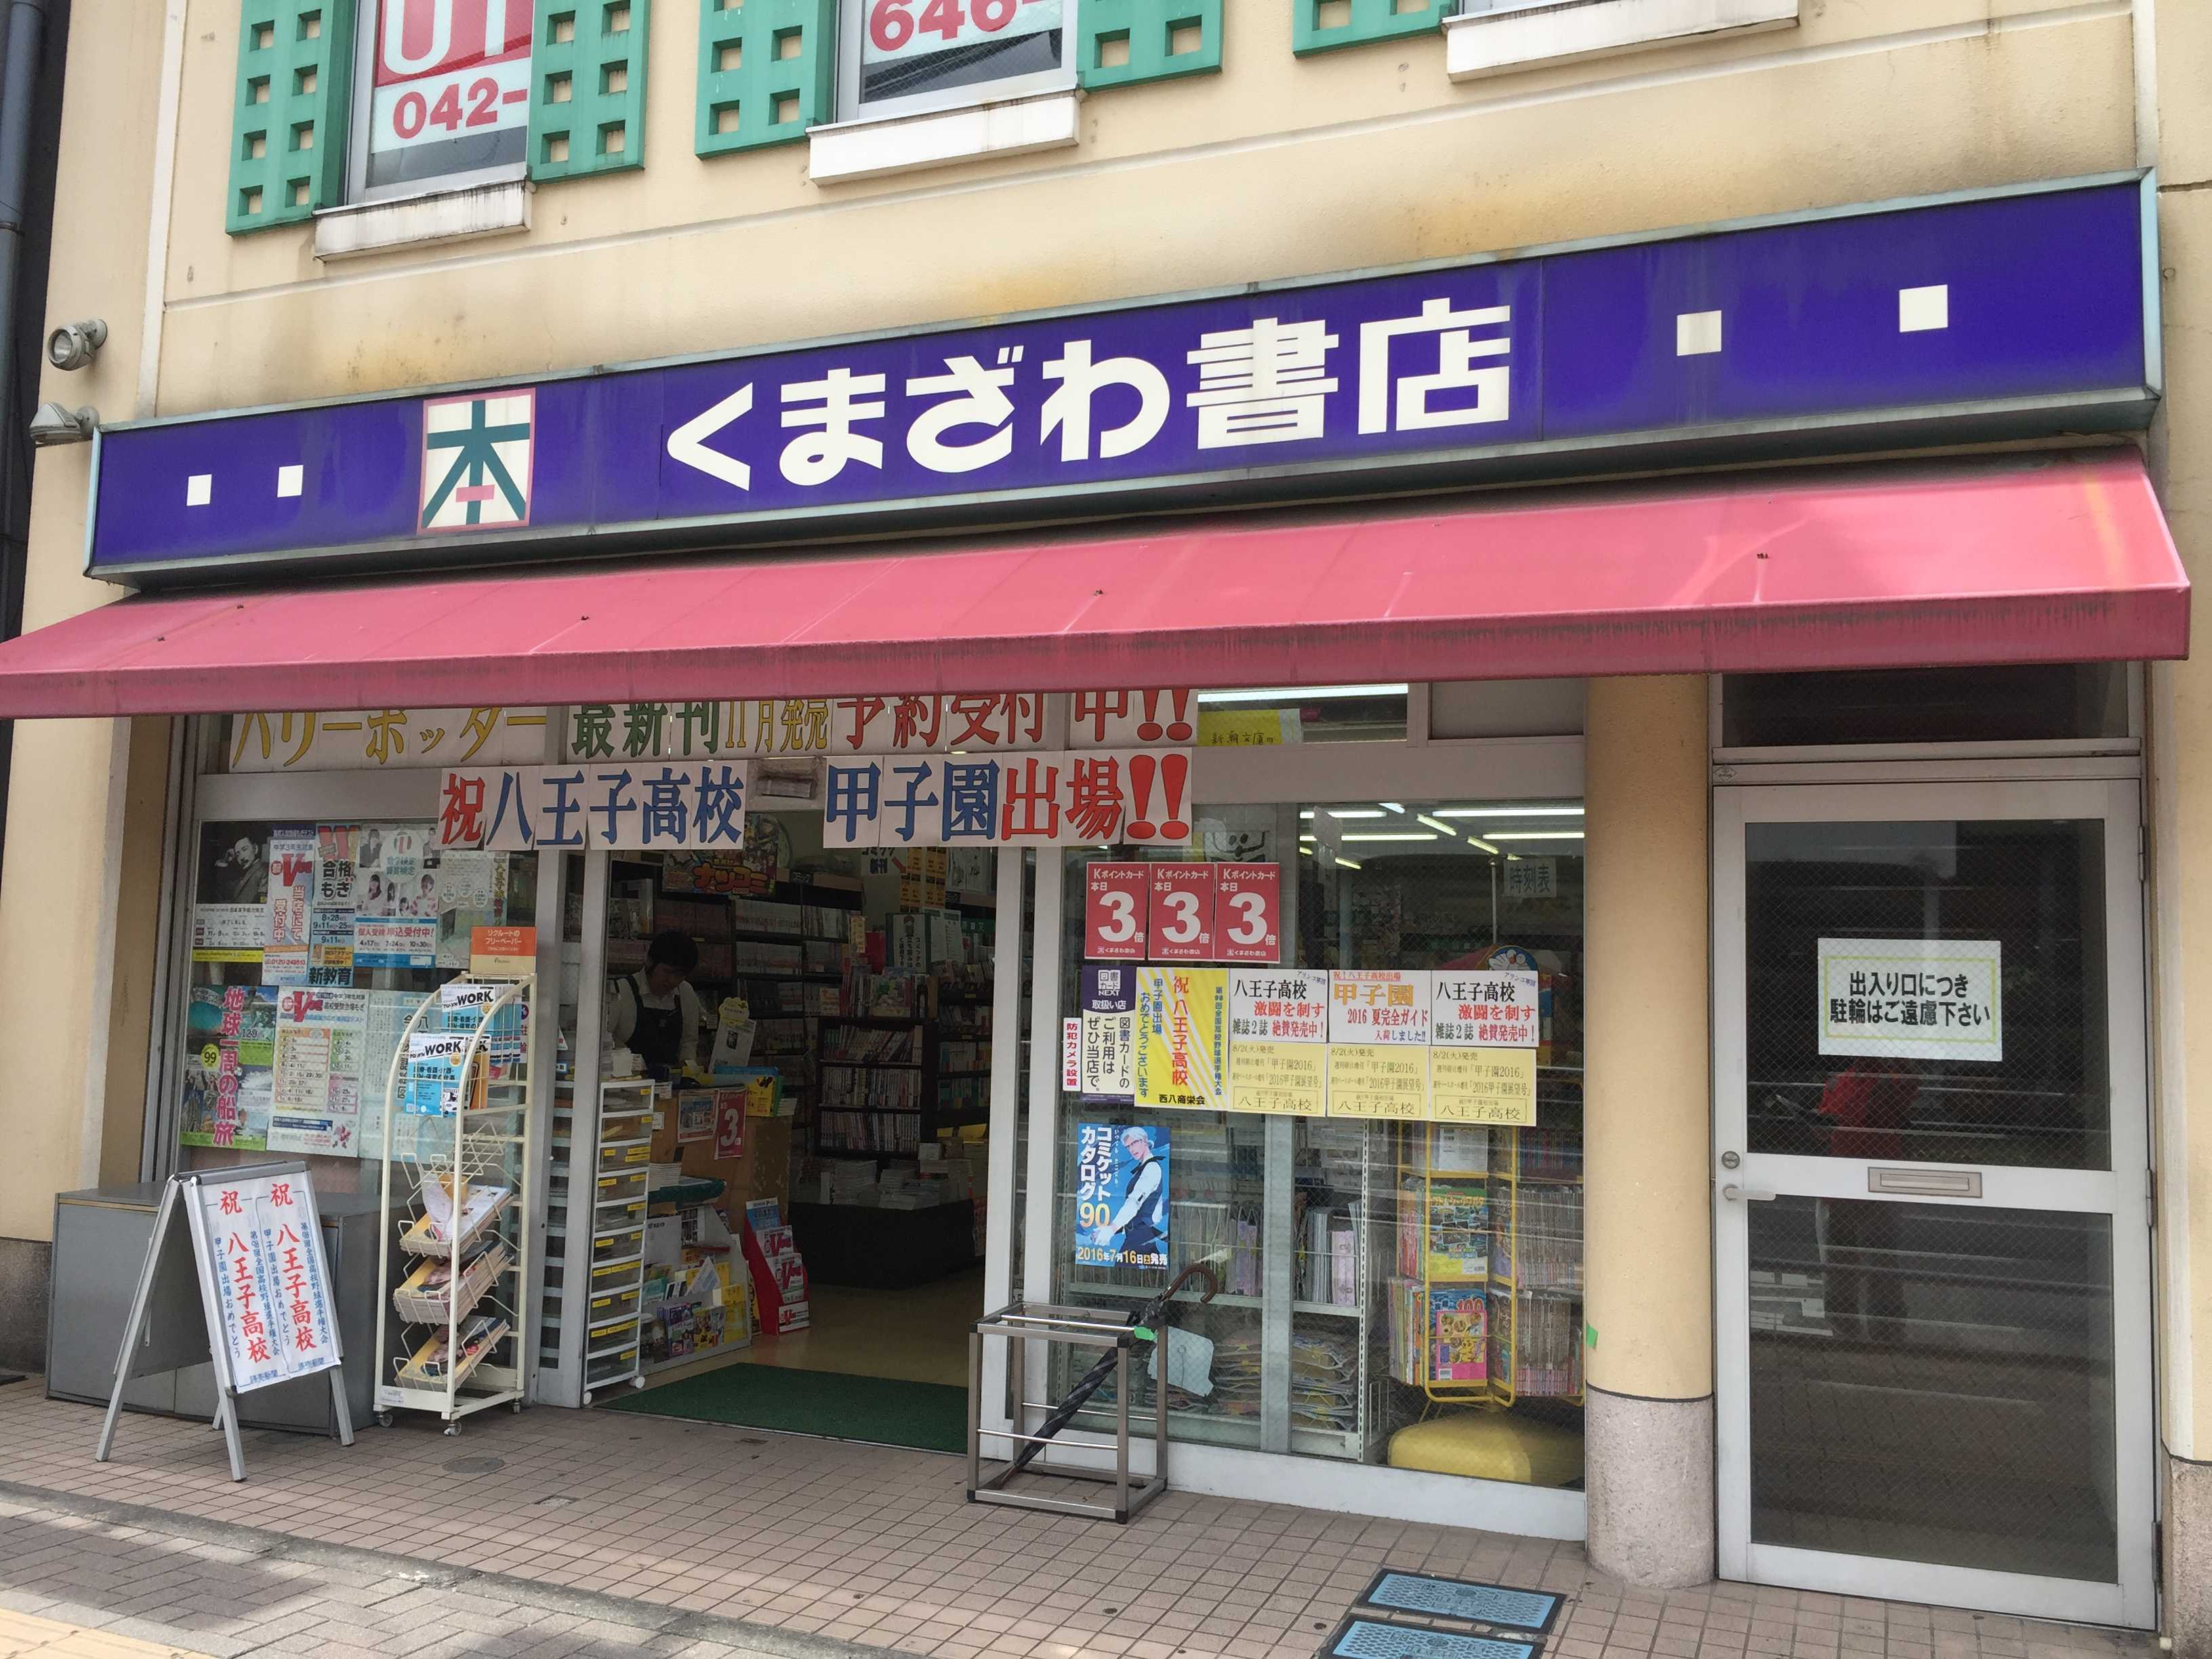 JR西八王子駅 北口 くまざわ書店 「祝 八王子高校 甲子園出場!!」